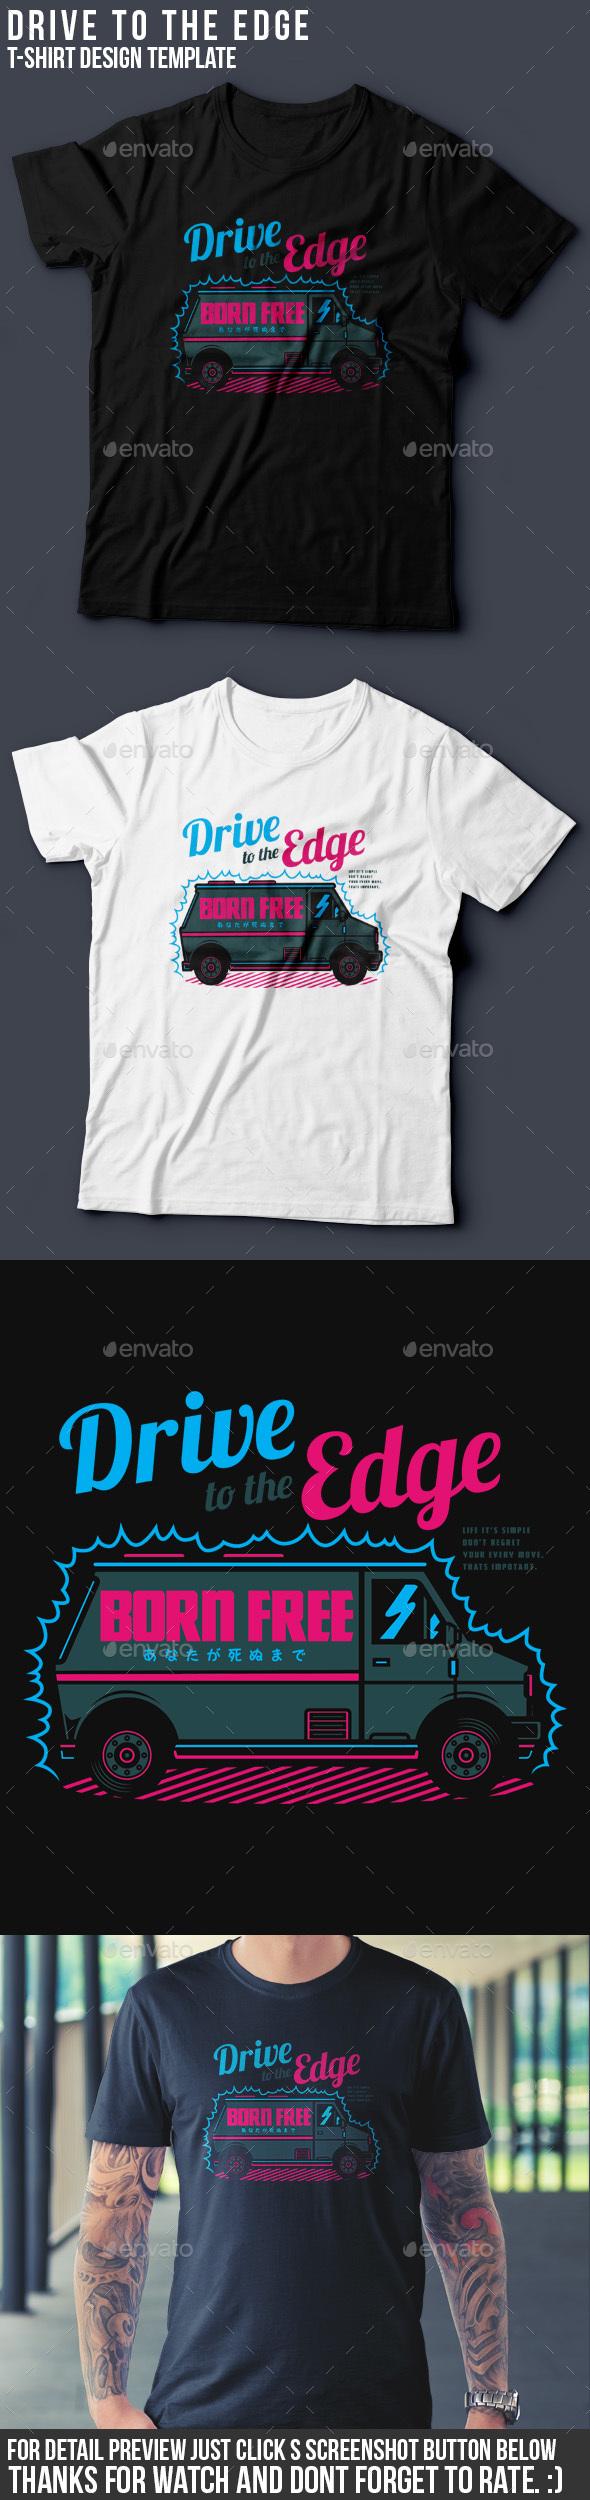 Drive to the Edge T-Shirt Design - Clean Designs